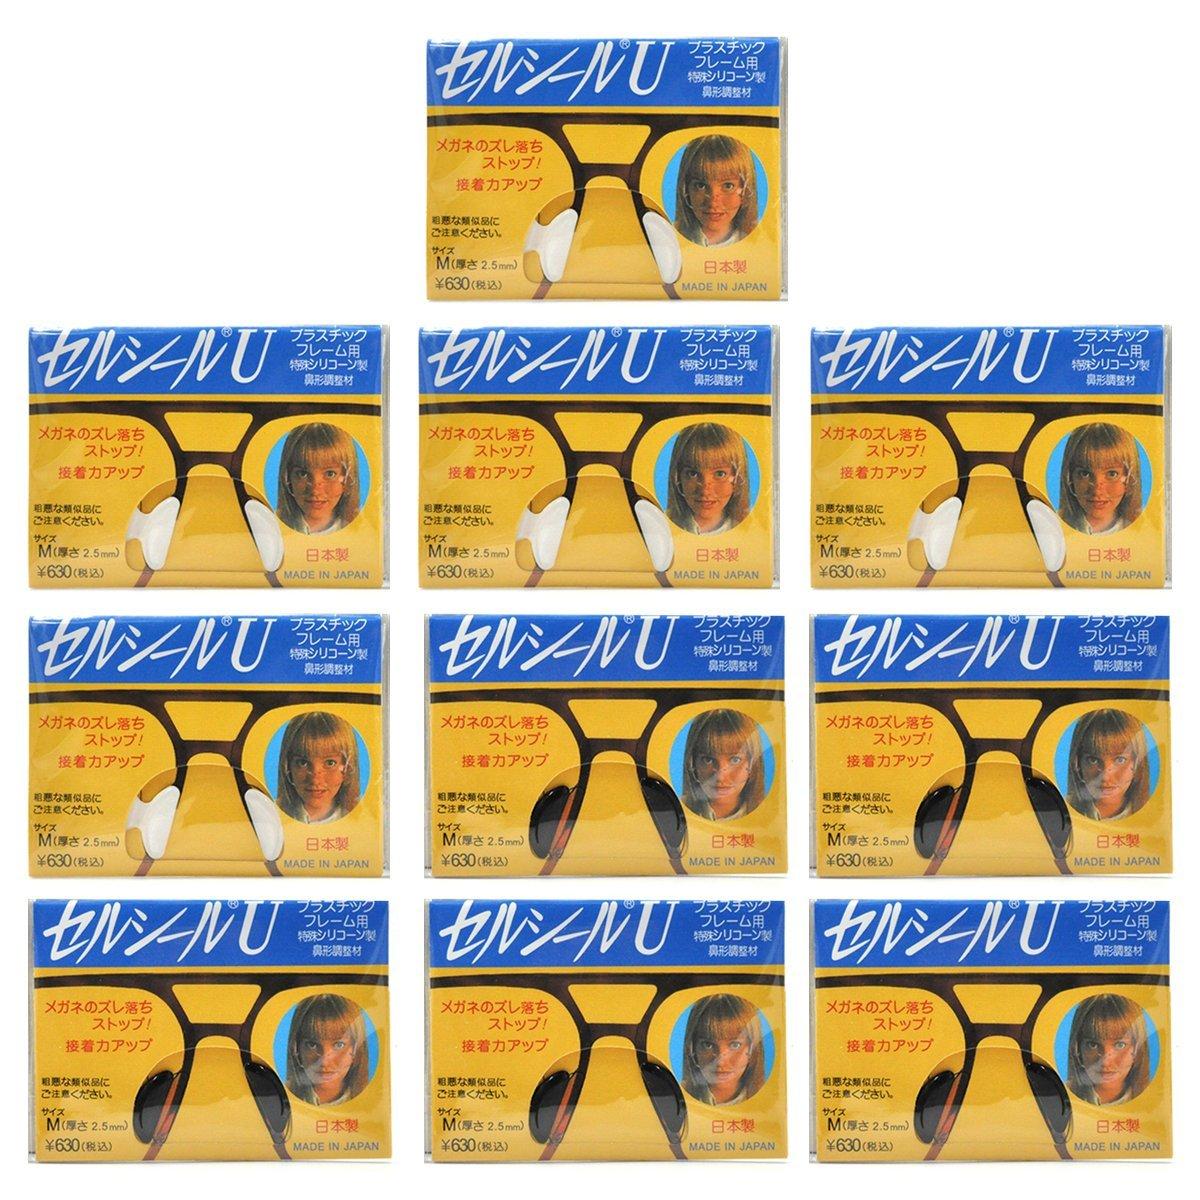 07af0159765 Get Quotations · eZAKKA Silicone Nose Pads 10 Pairs 2.5mm Anti-Slip  Adhesive Stick on Eyeglass Sunglass